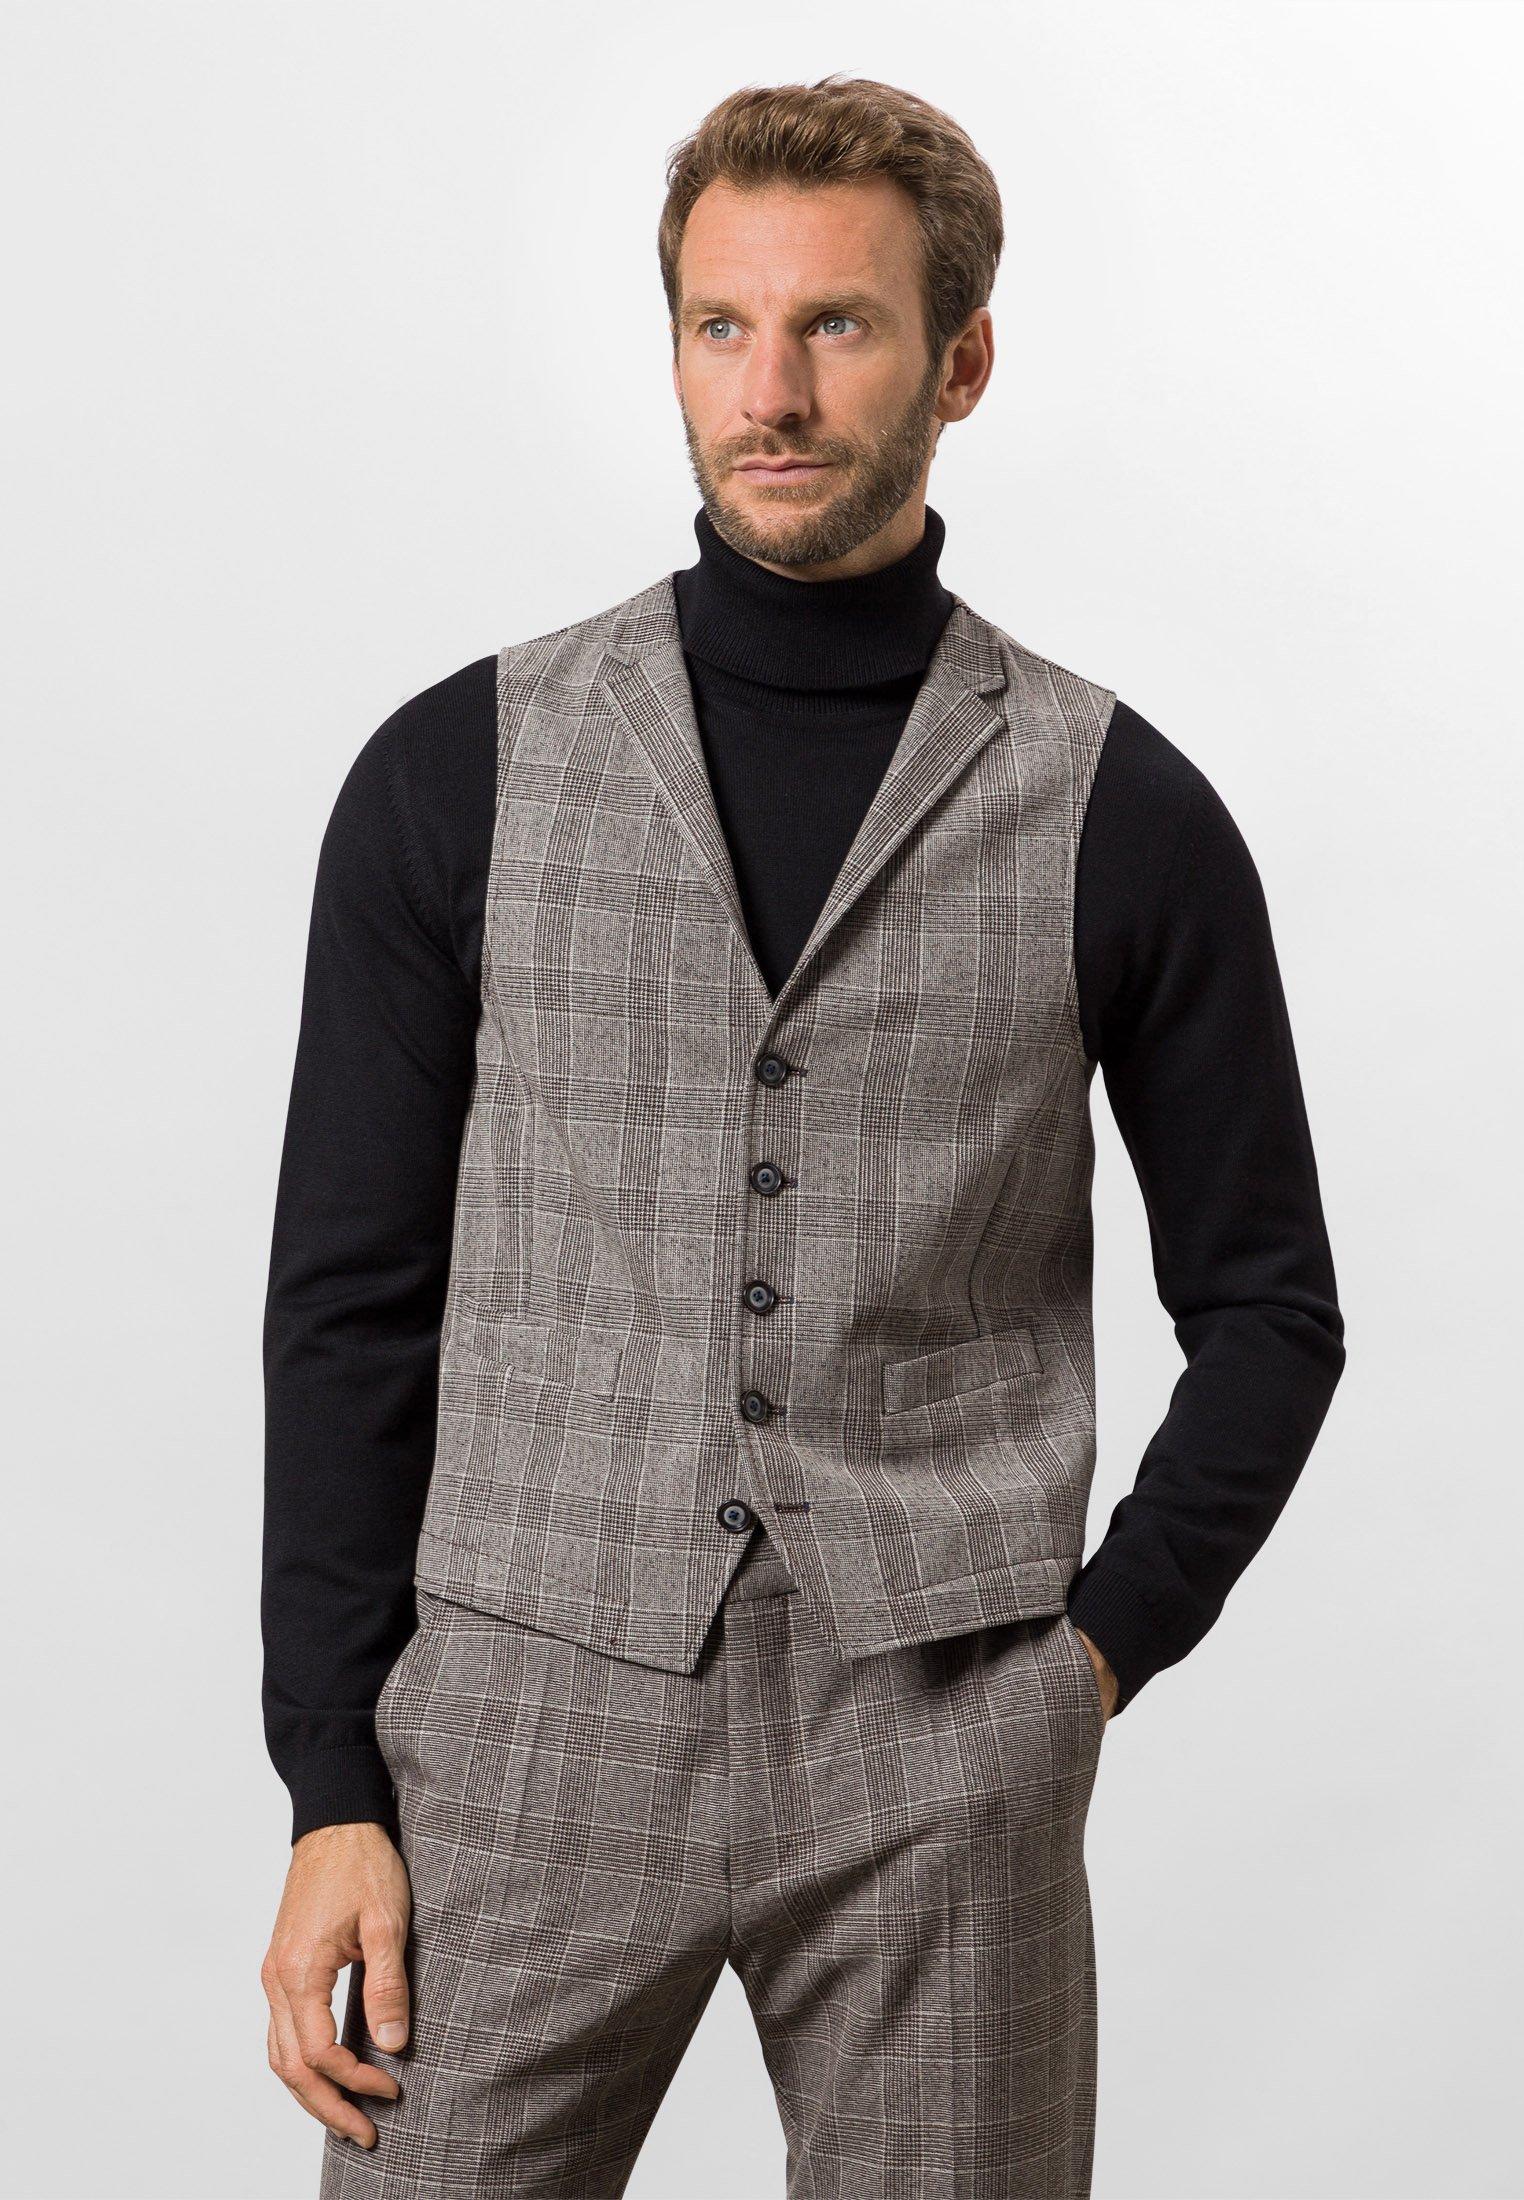 Homme FUTUREFLEX, KARIERT GIB - Gilet de costume